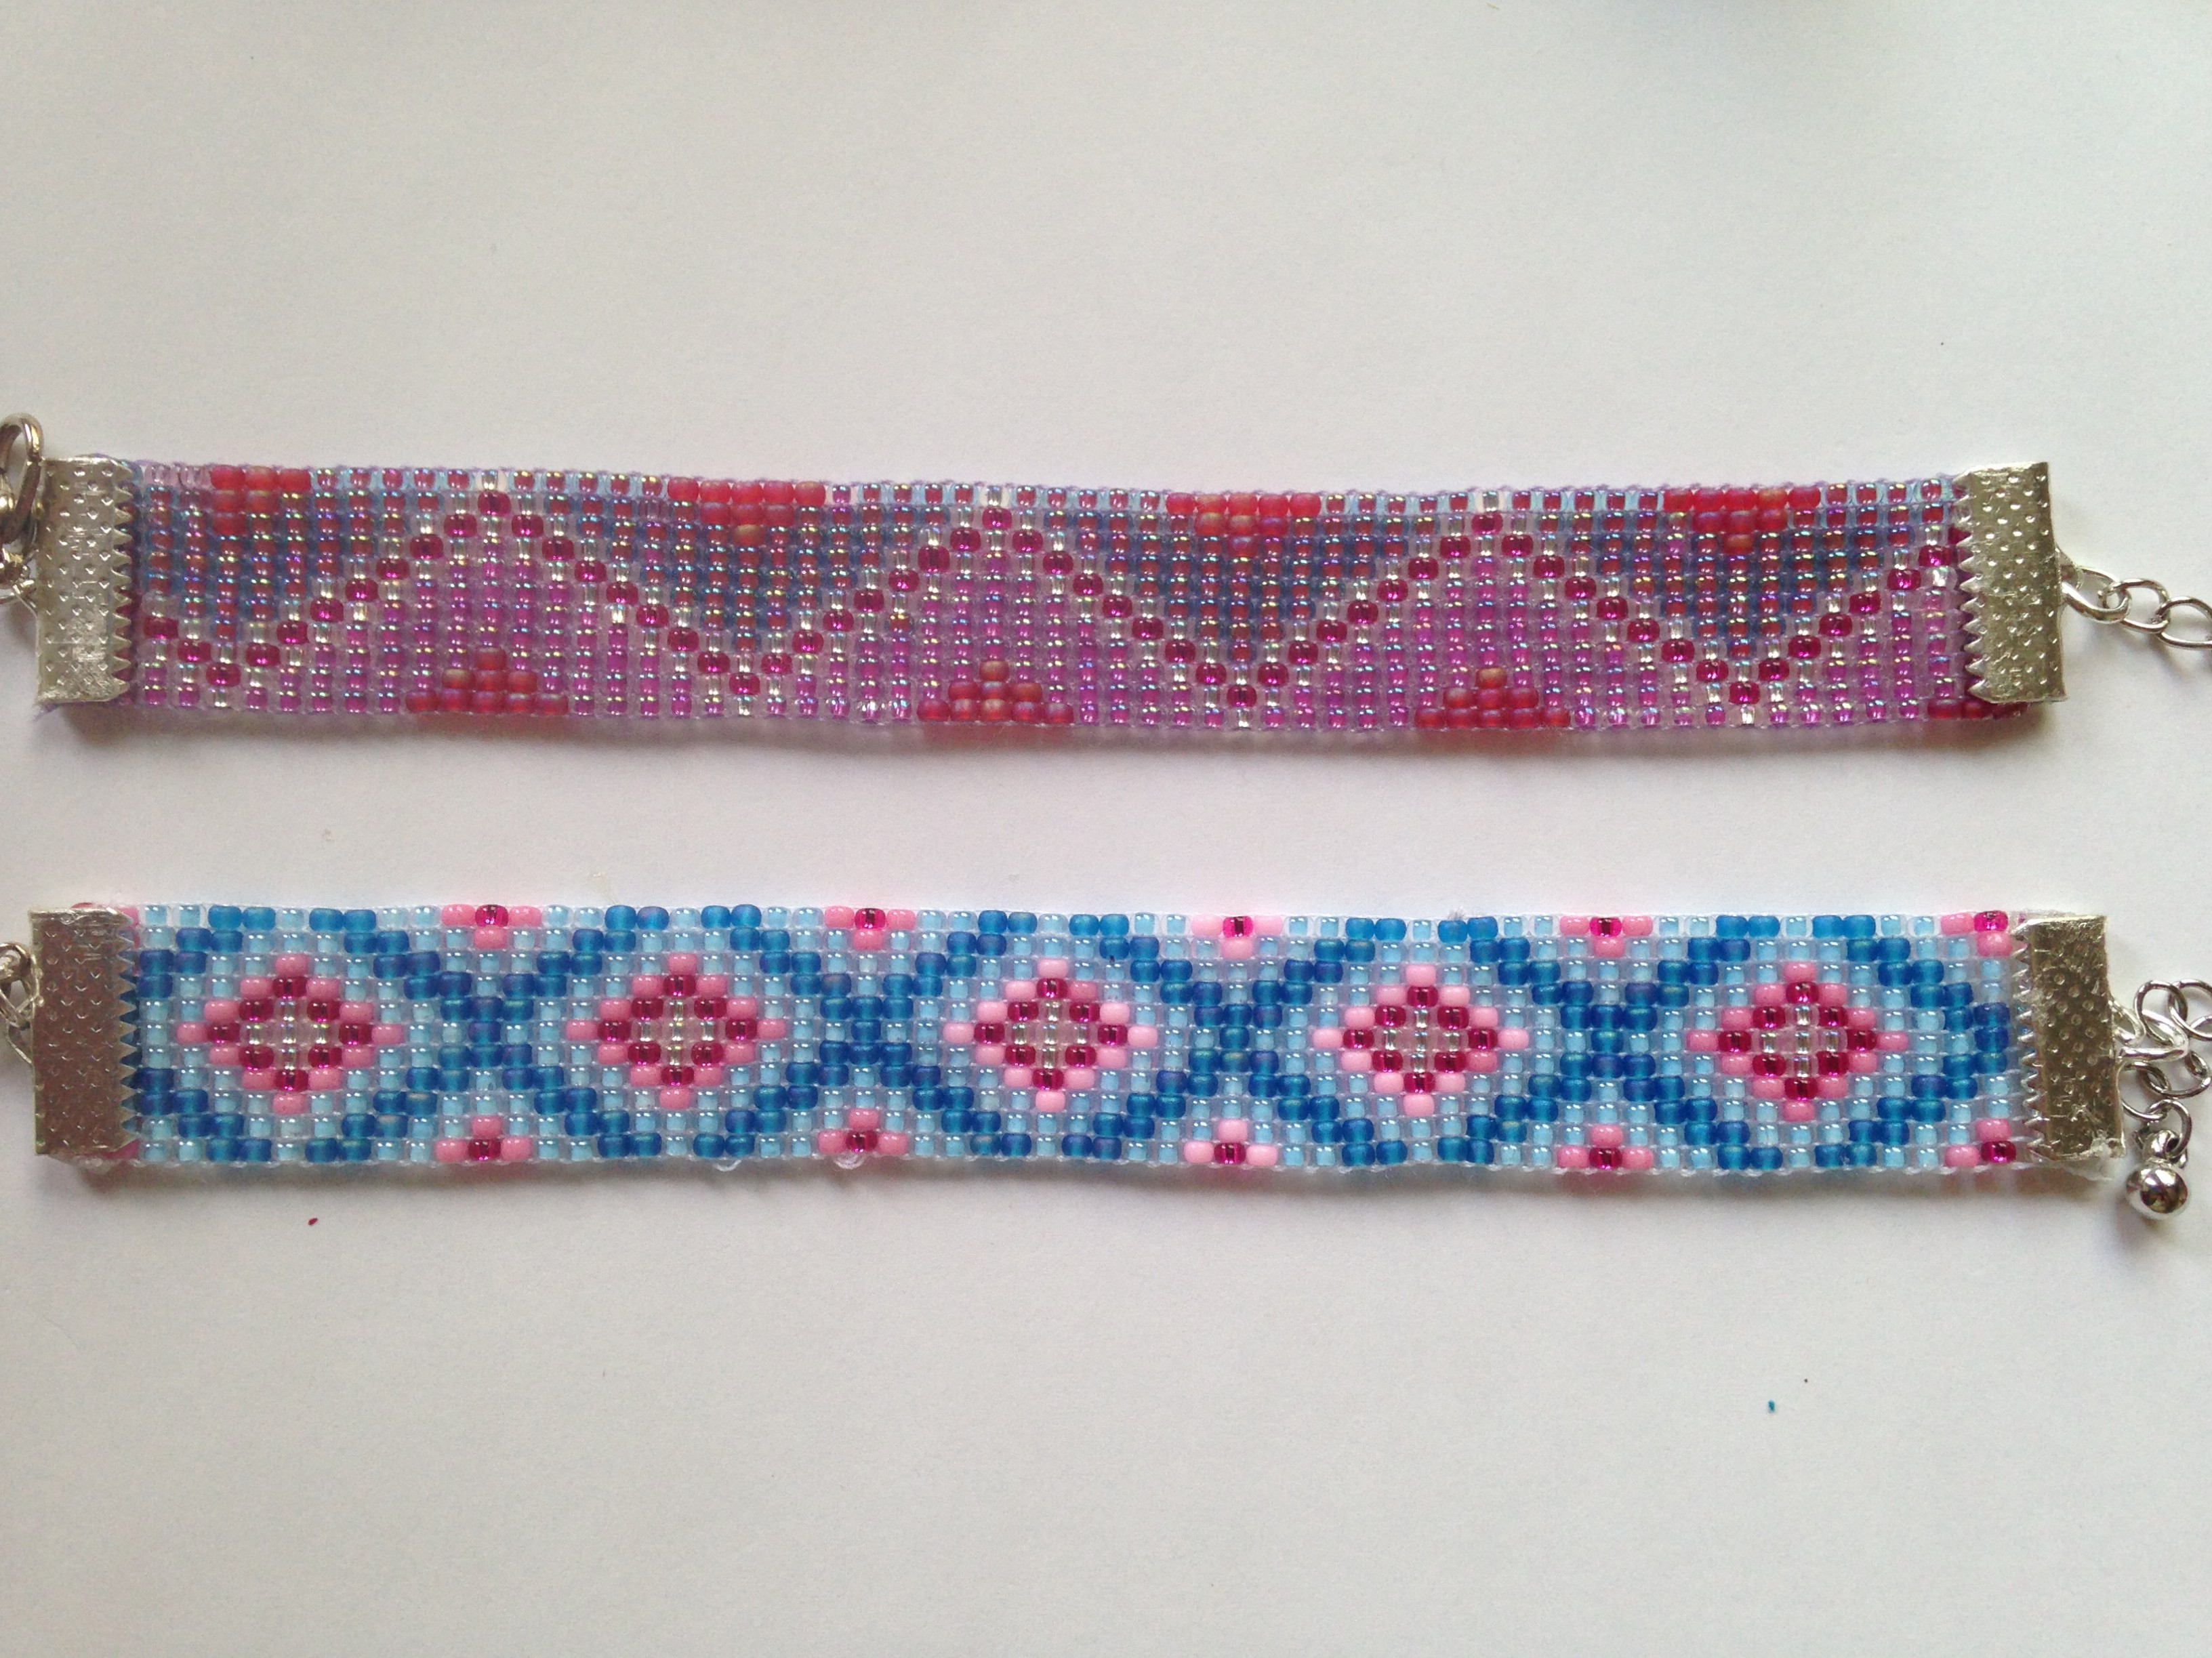 Gut bekannt bracelets en tissage de perles, coloris variés – Miliecreation- Neya VH47